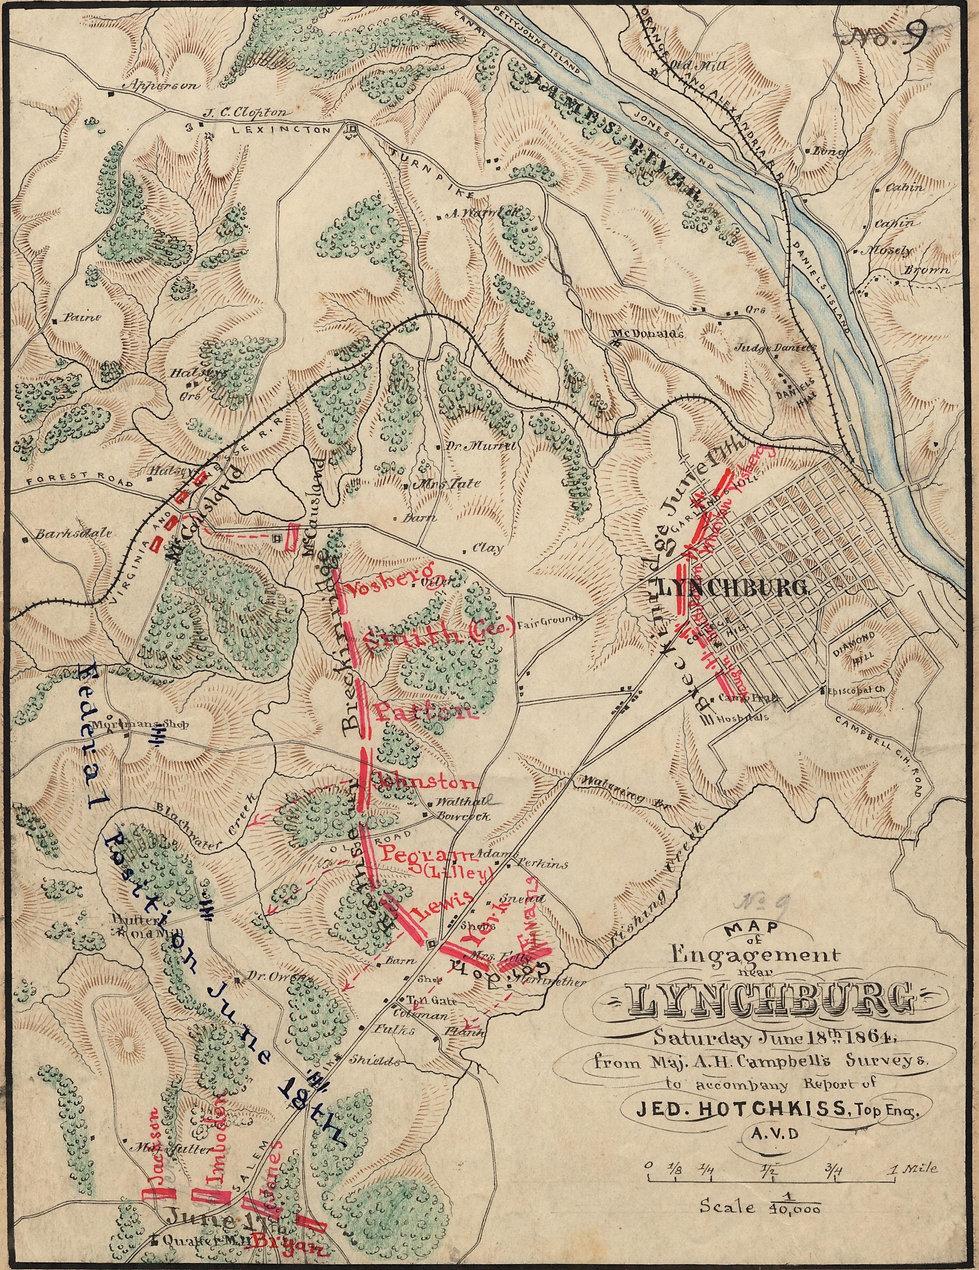 Hotchkiss Lynchburg Map cropped.jpg